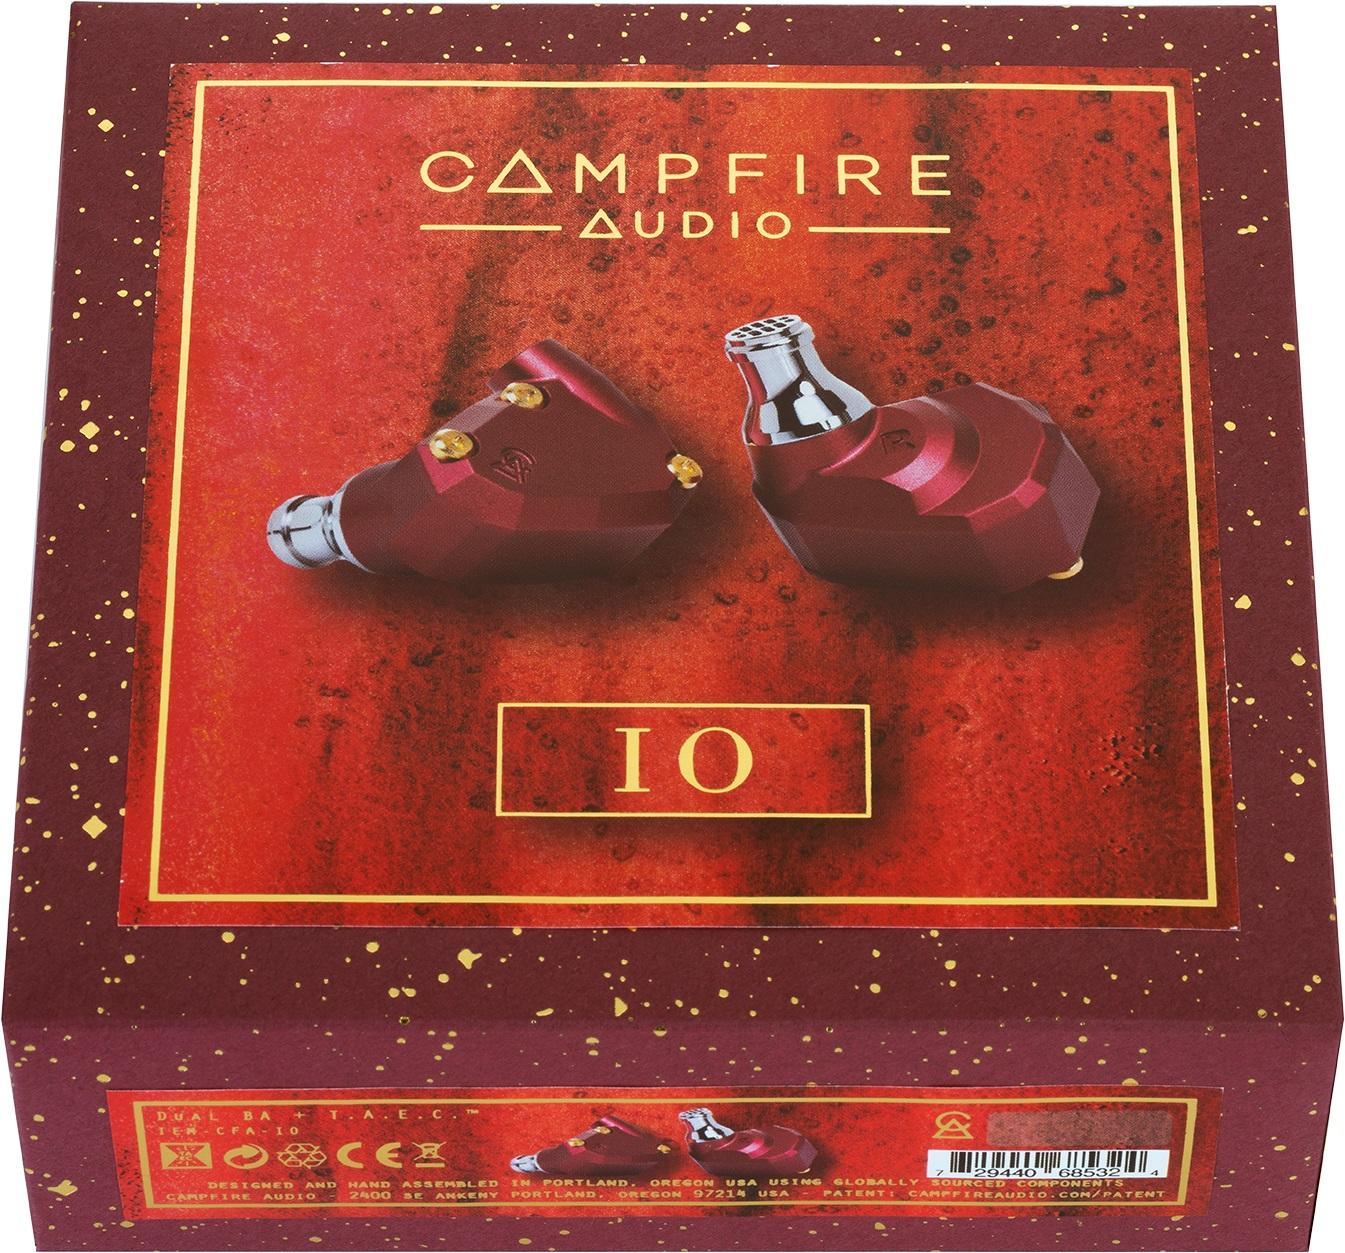 Campfire Audio IO коробка